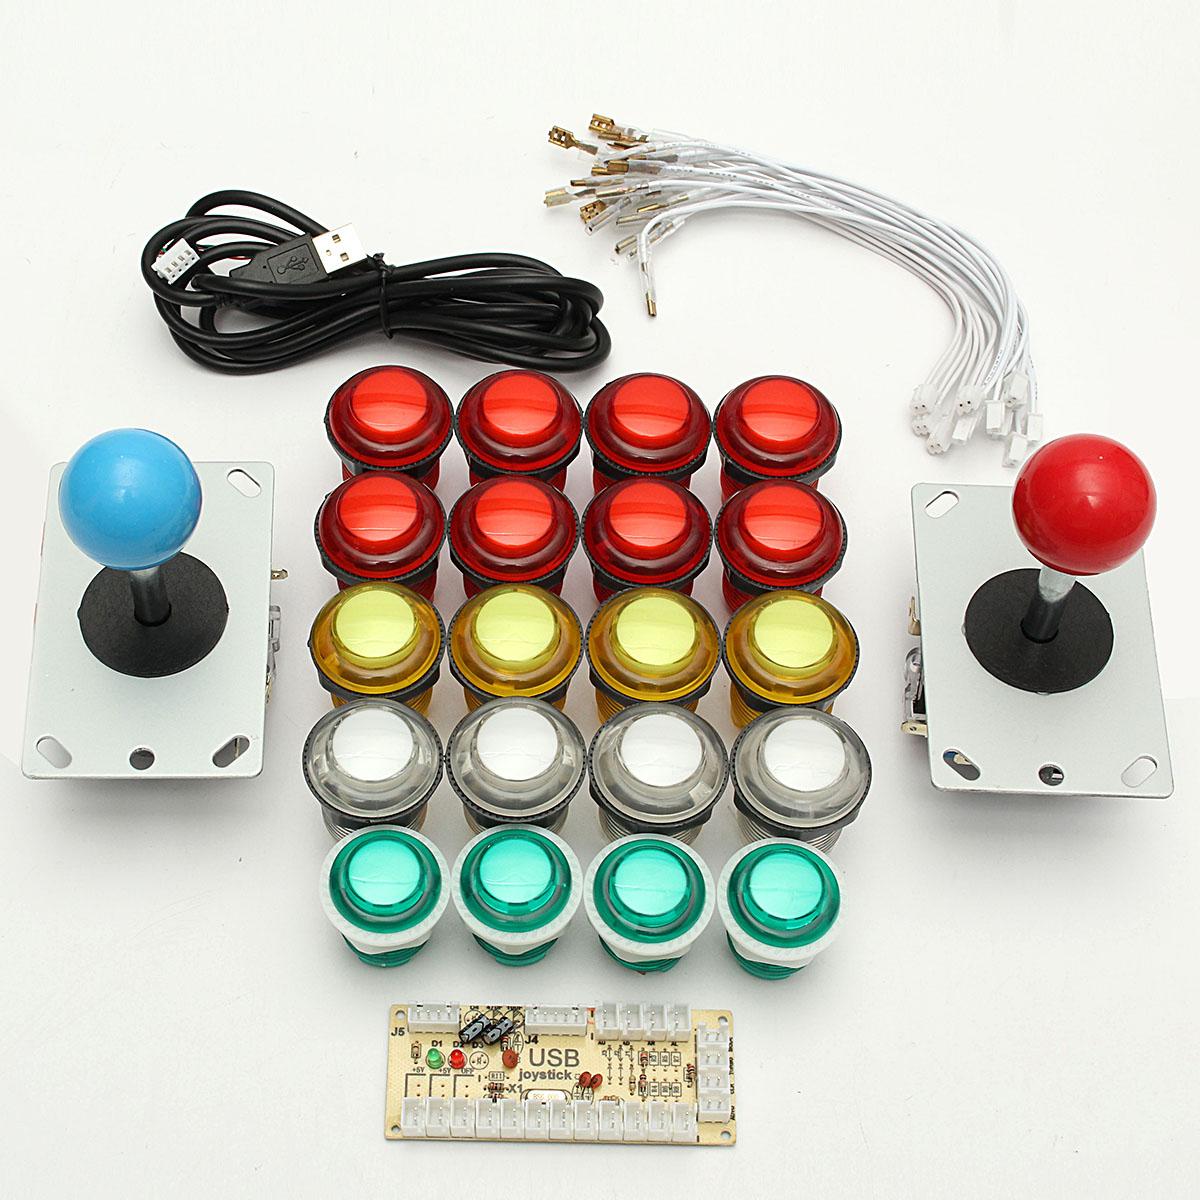 Dual Player USB Encoder 8 Way Joystick LED Illuminated Buttons PC Arcade Games DIY Kit